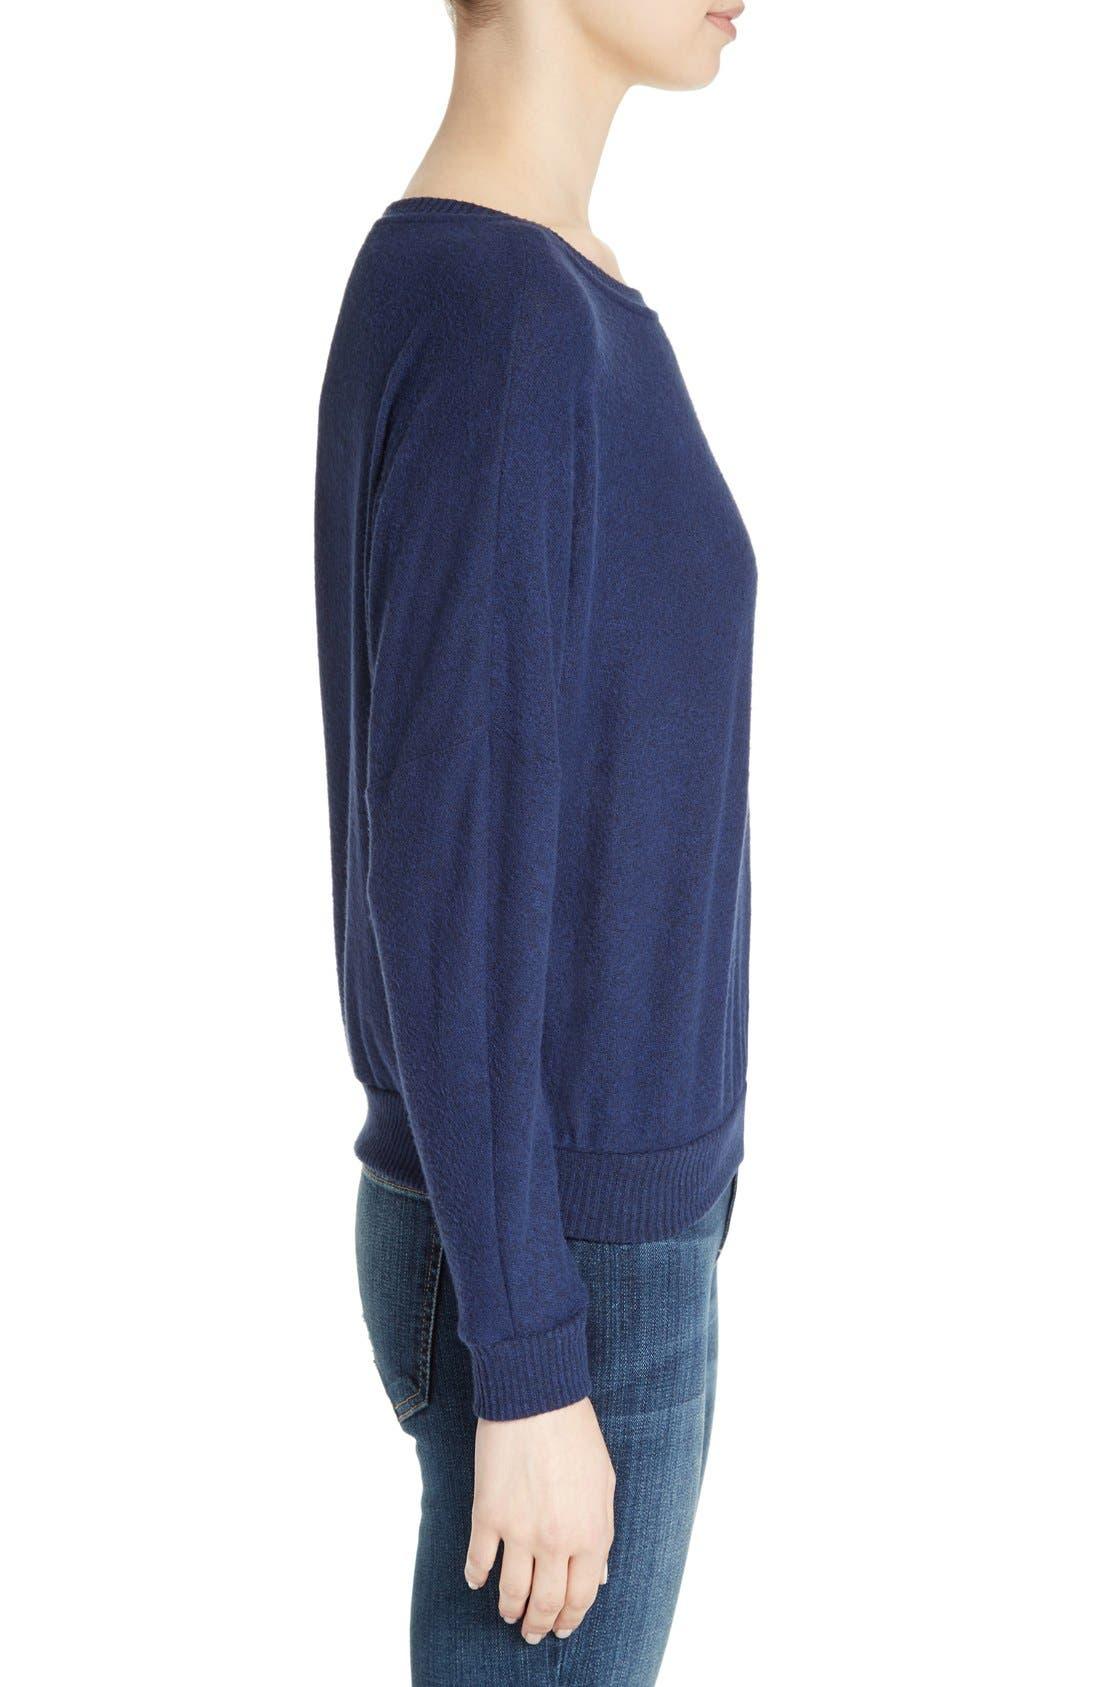 JOIE, Soft Joie Giardia Drop Shoulder Sweater, Alternate thumbnail 3, color, PEACOAT